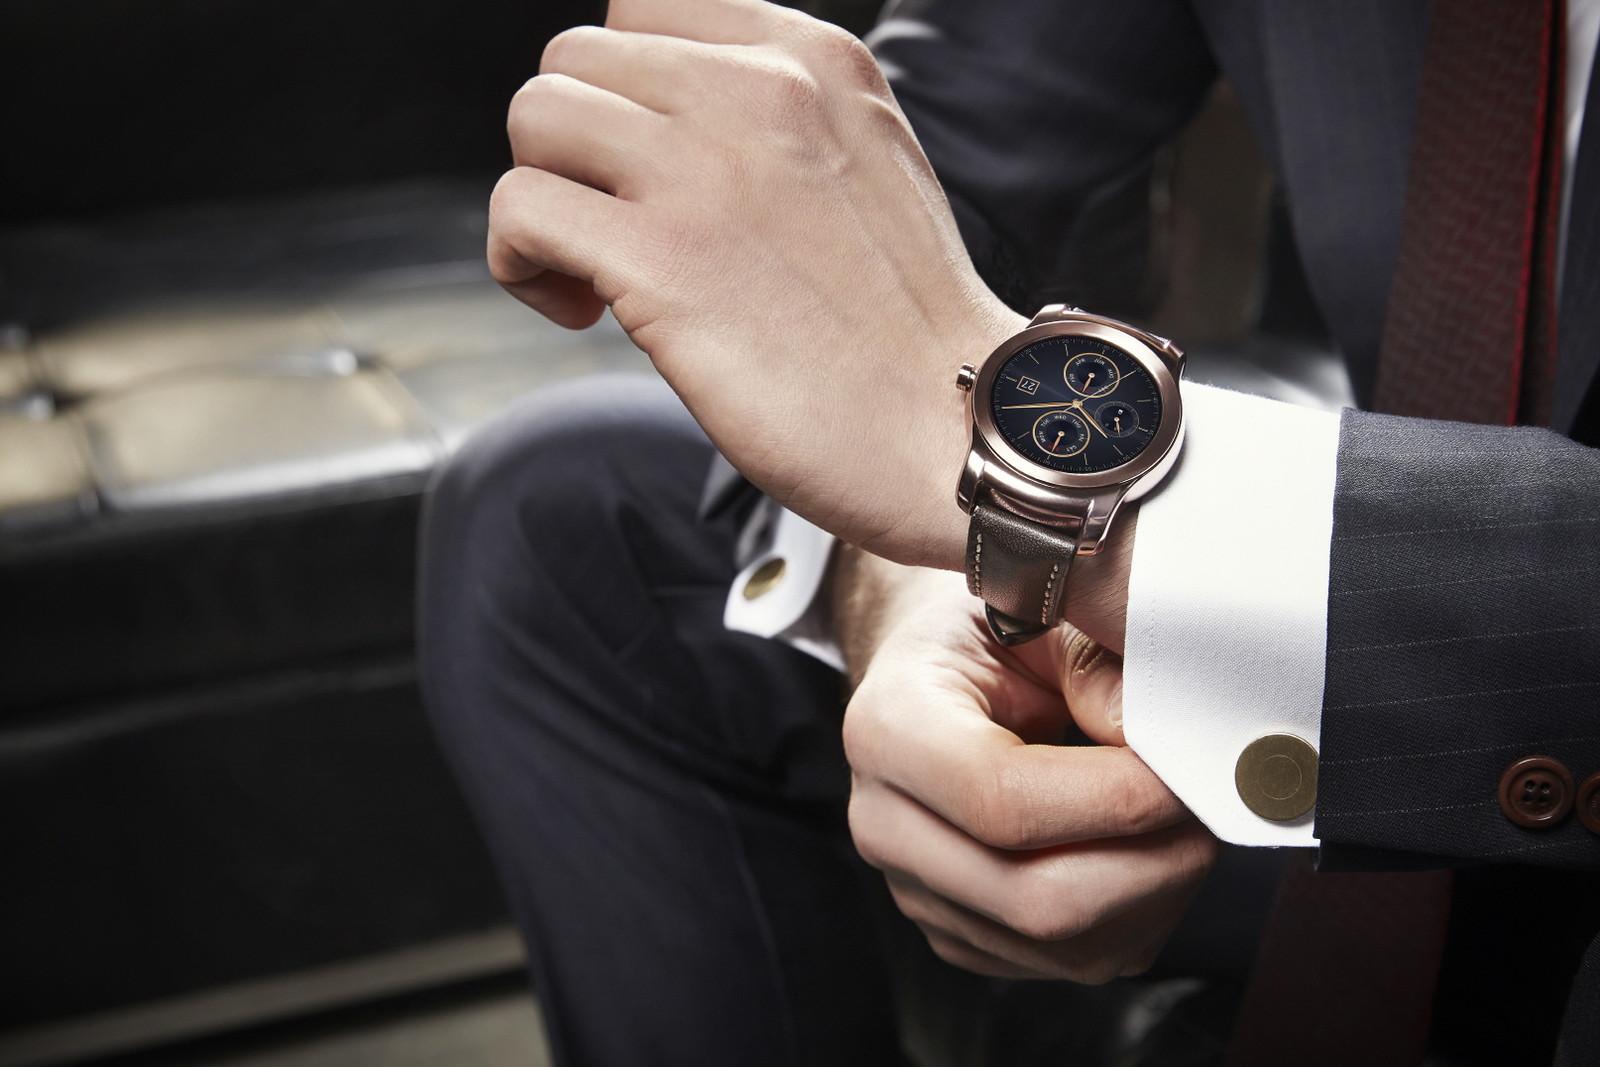 lg watch urbane suit